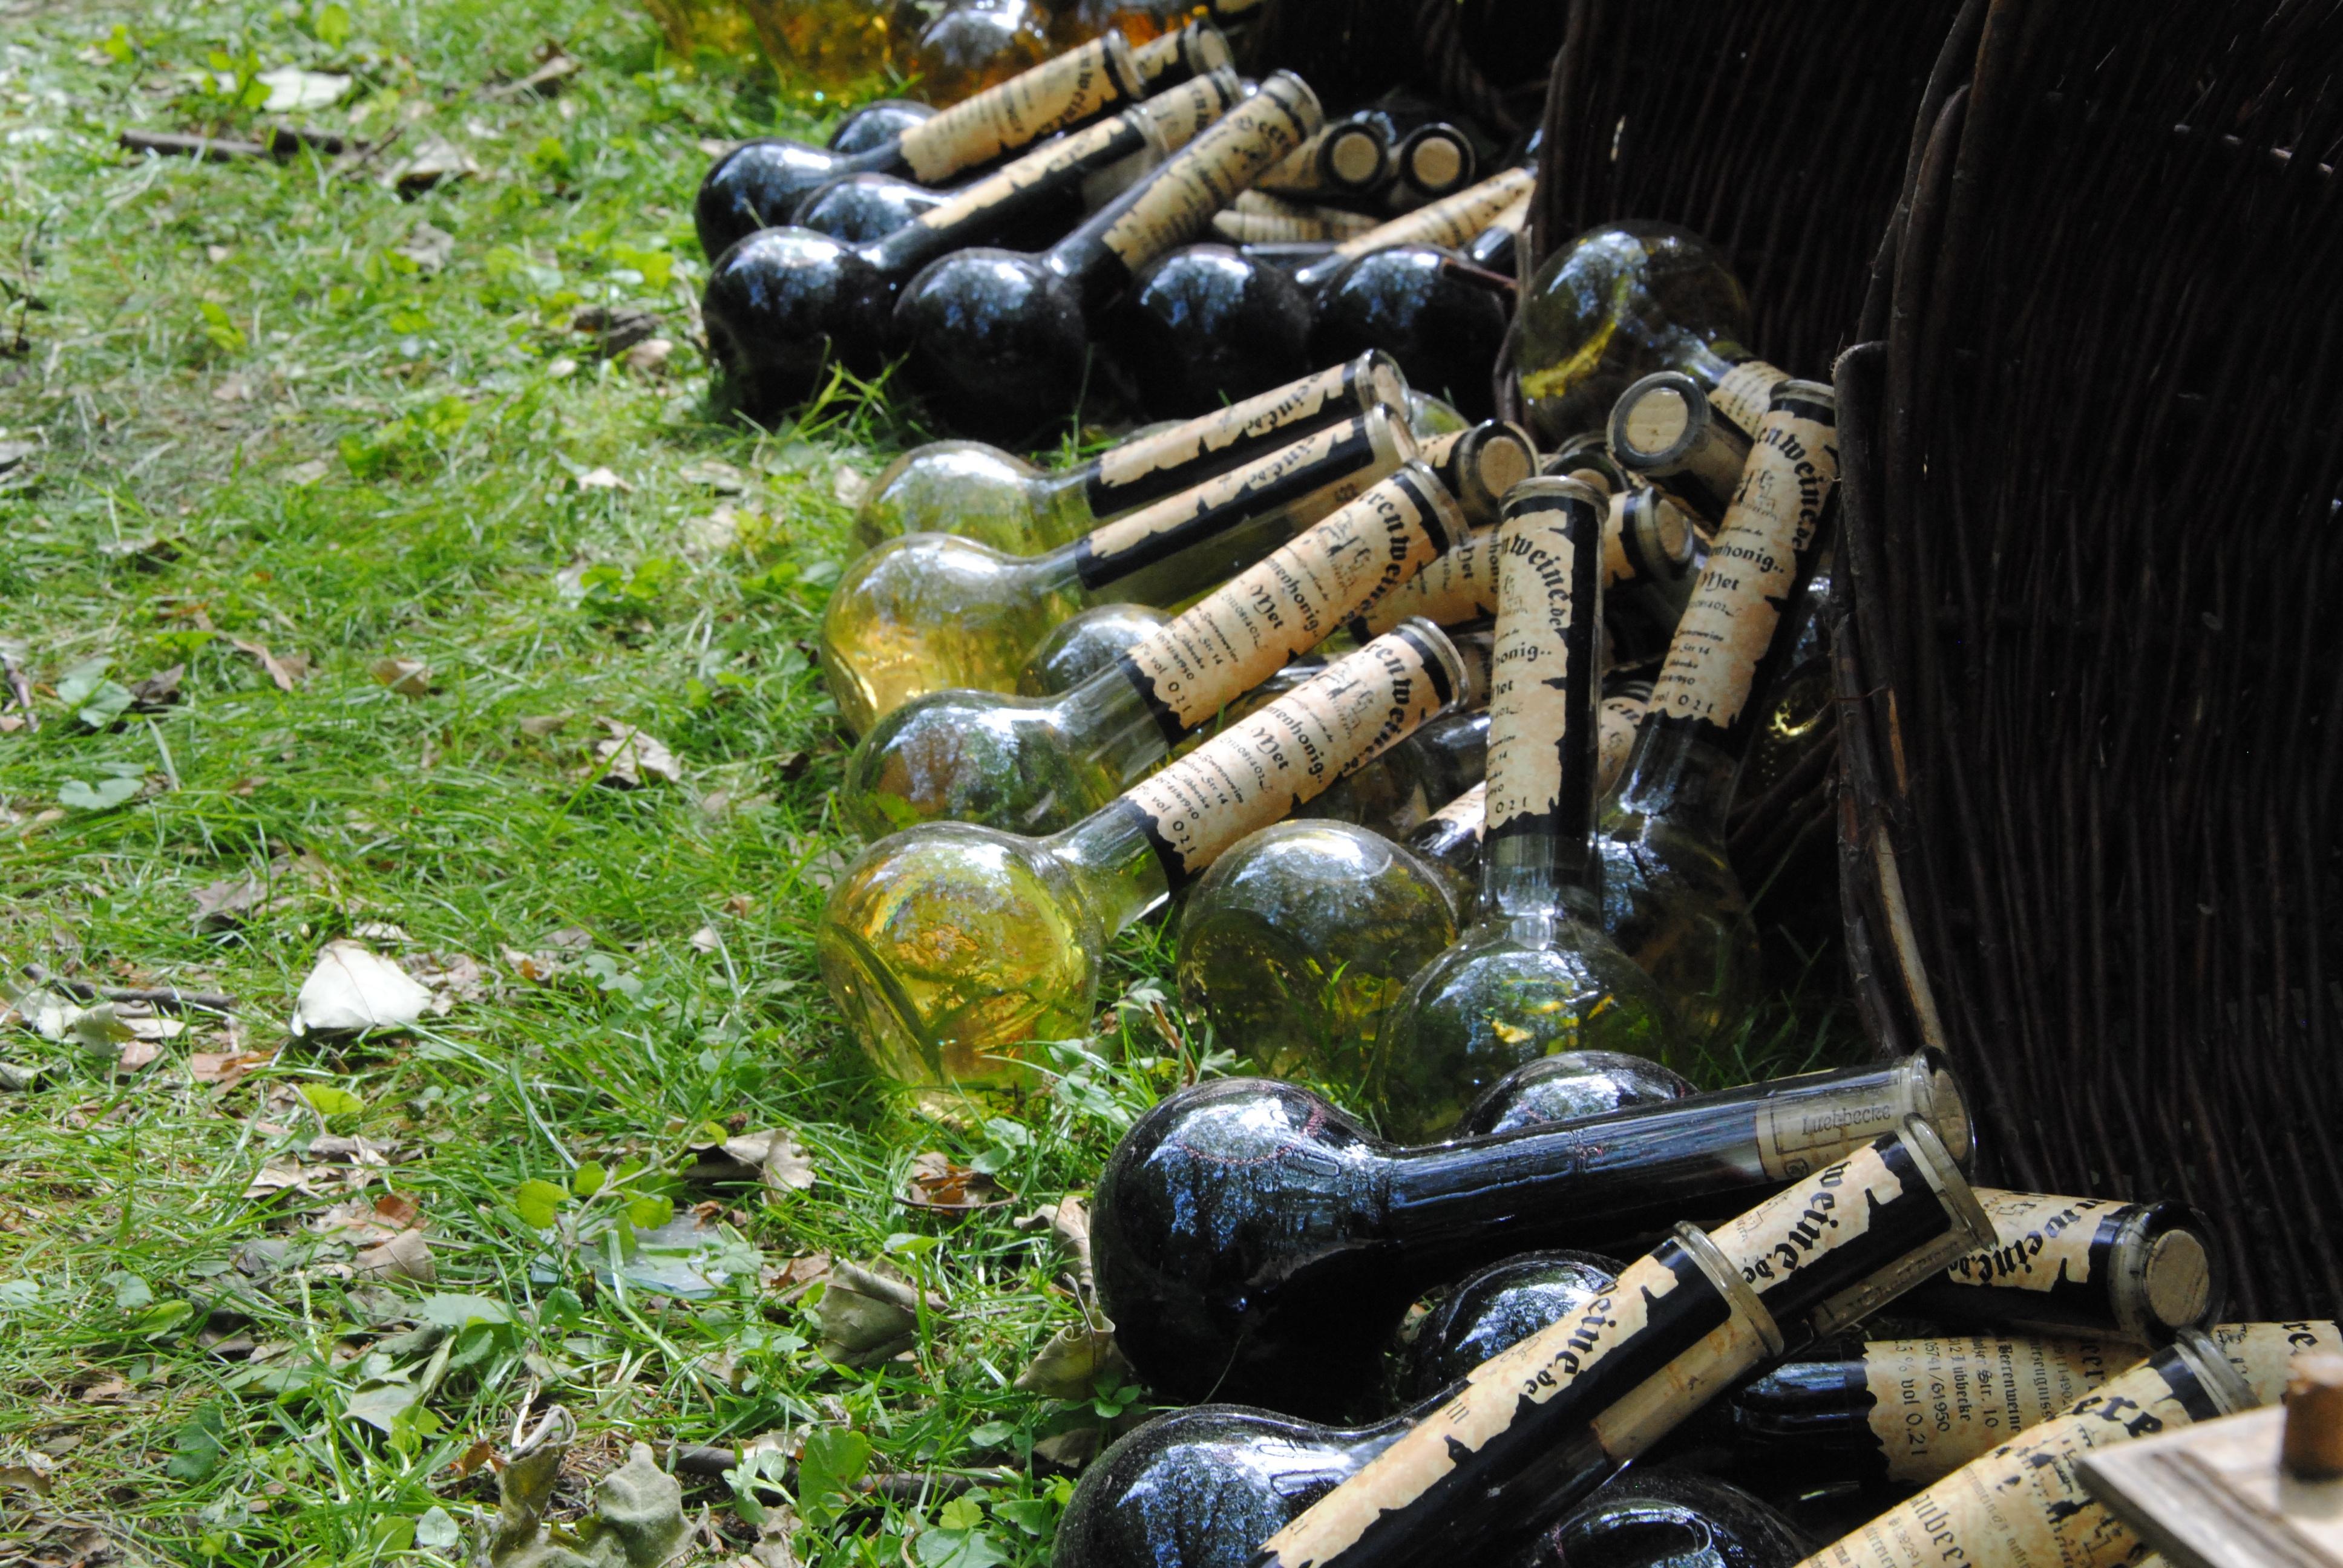 Free Images : Decoration, Soldier, Drink, Bottle, Sale